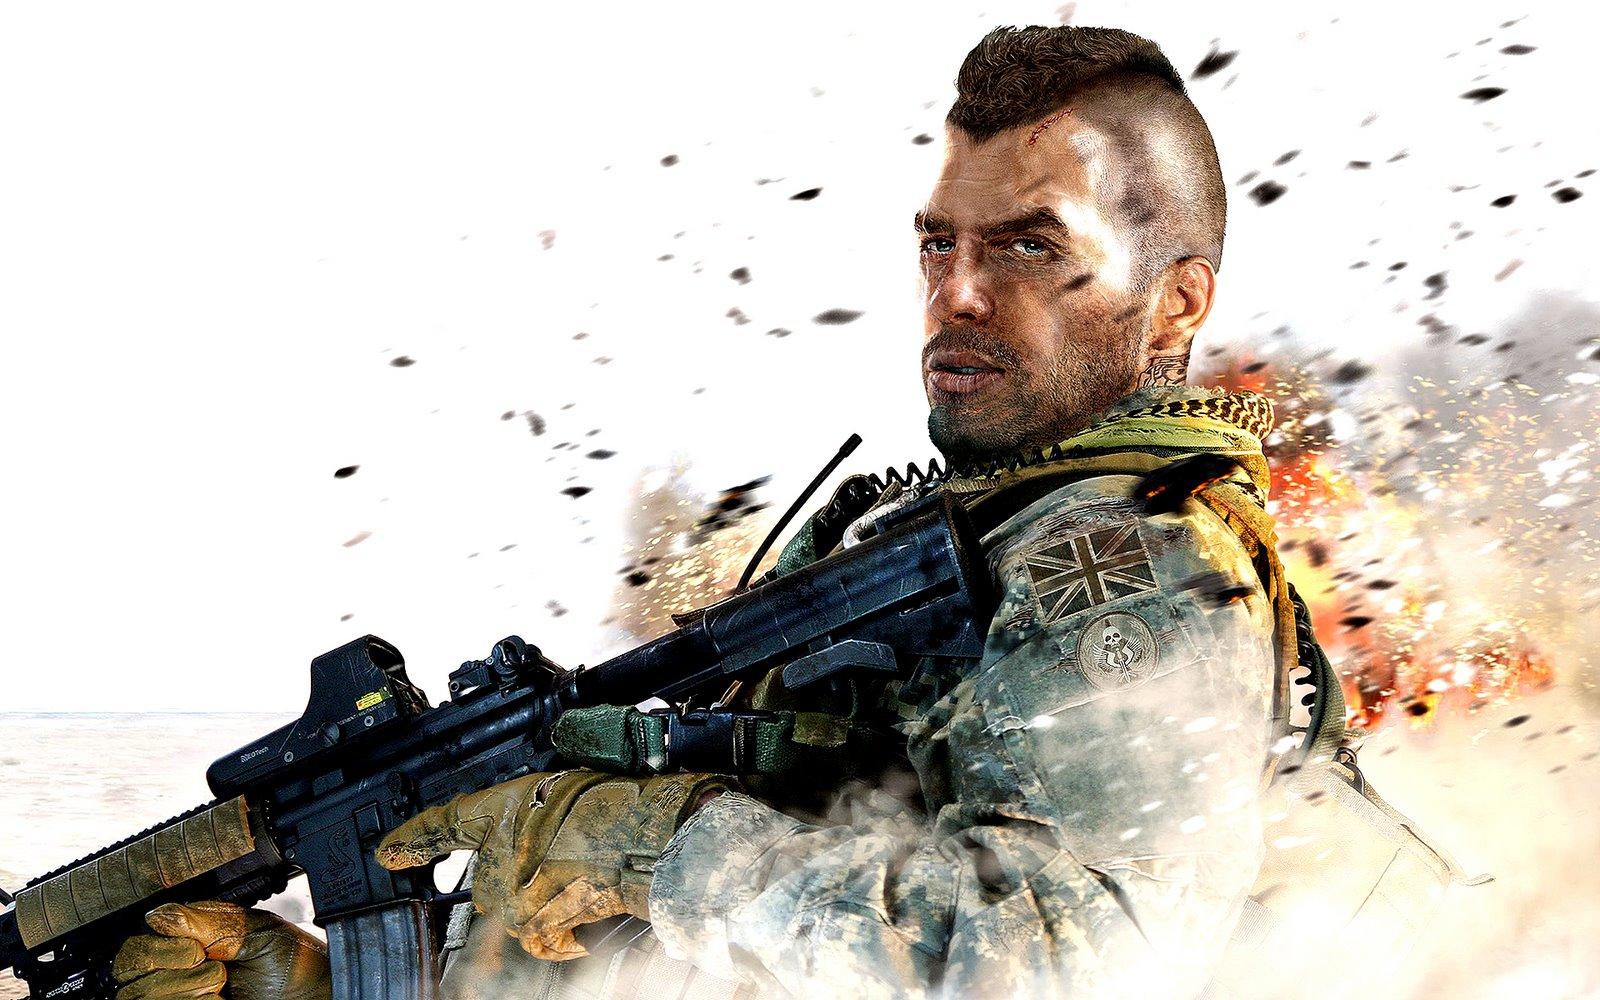 Call Of Duty Modern Warfare 2 Hd Wallpaper 2 Playstation Blog